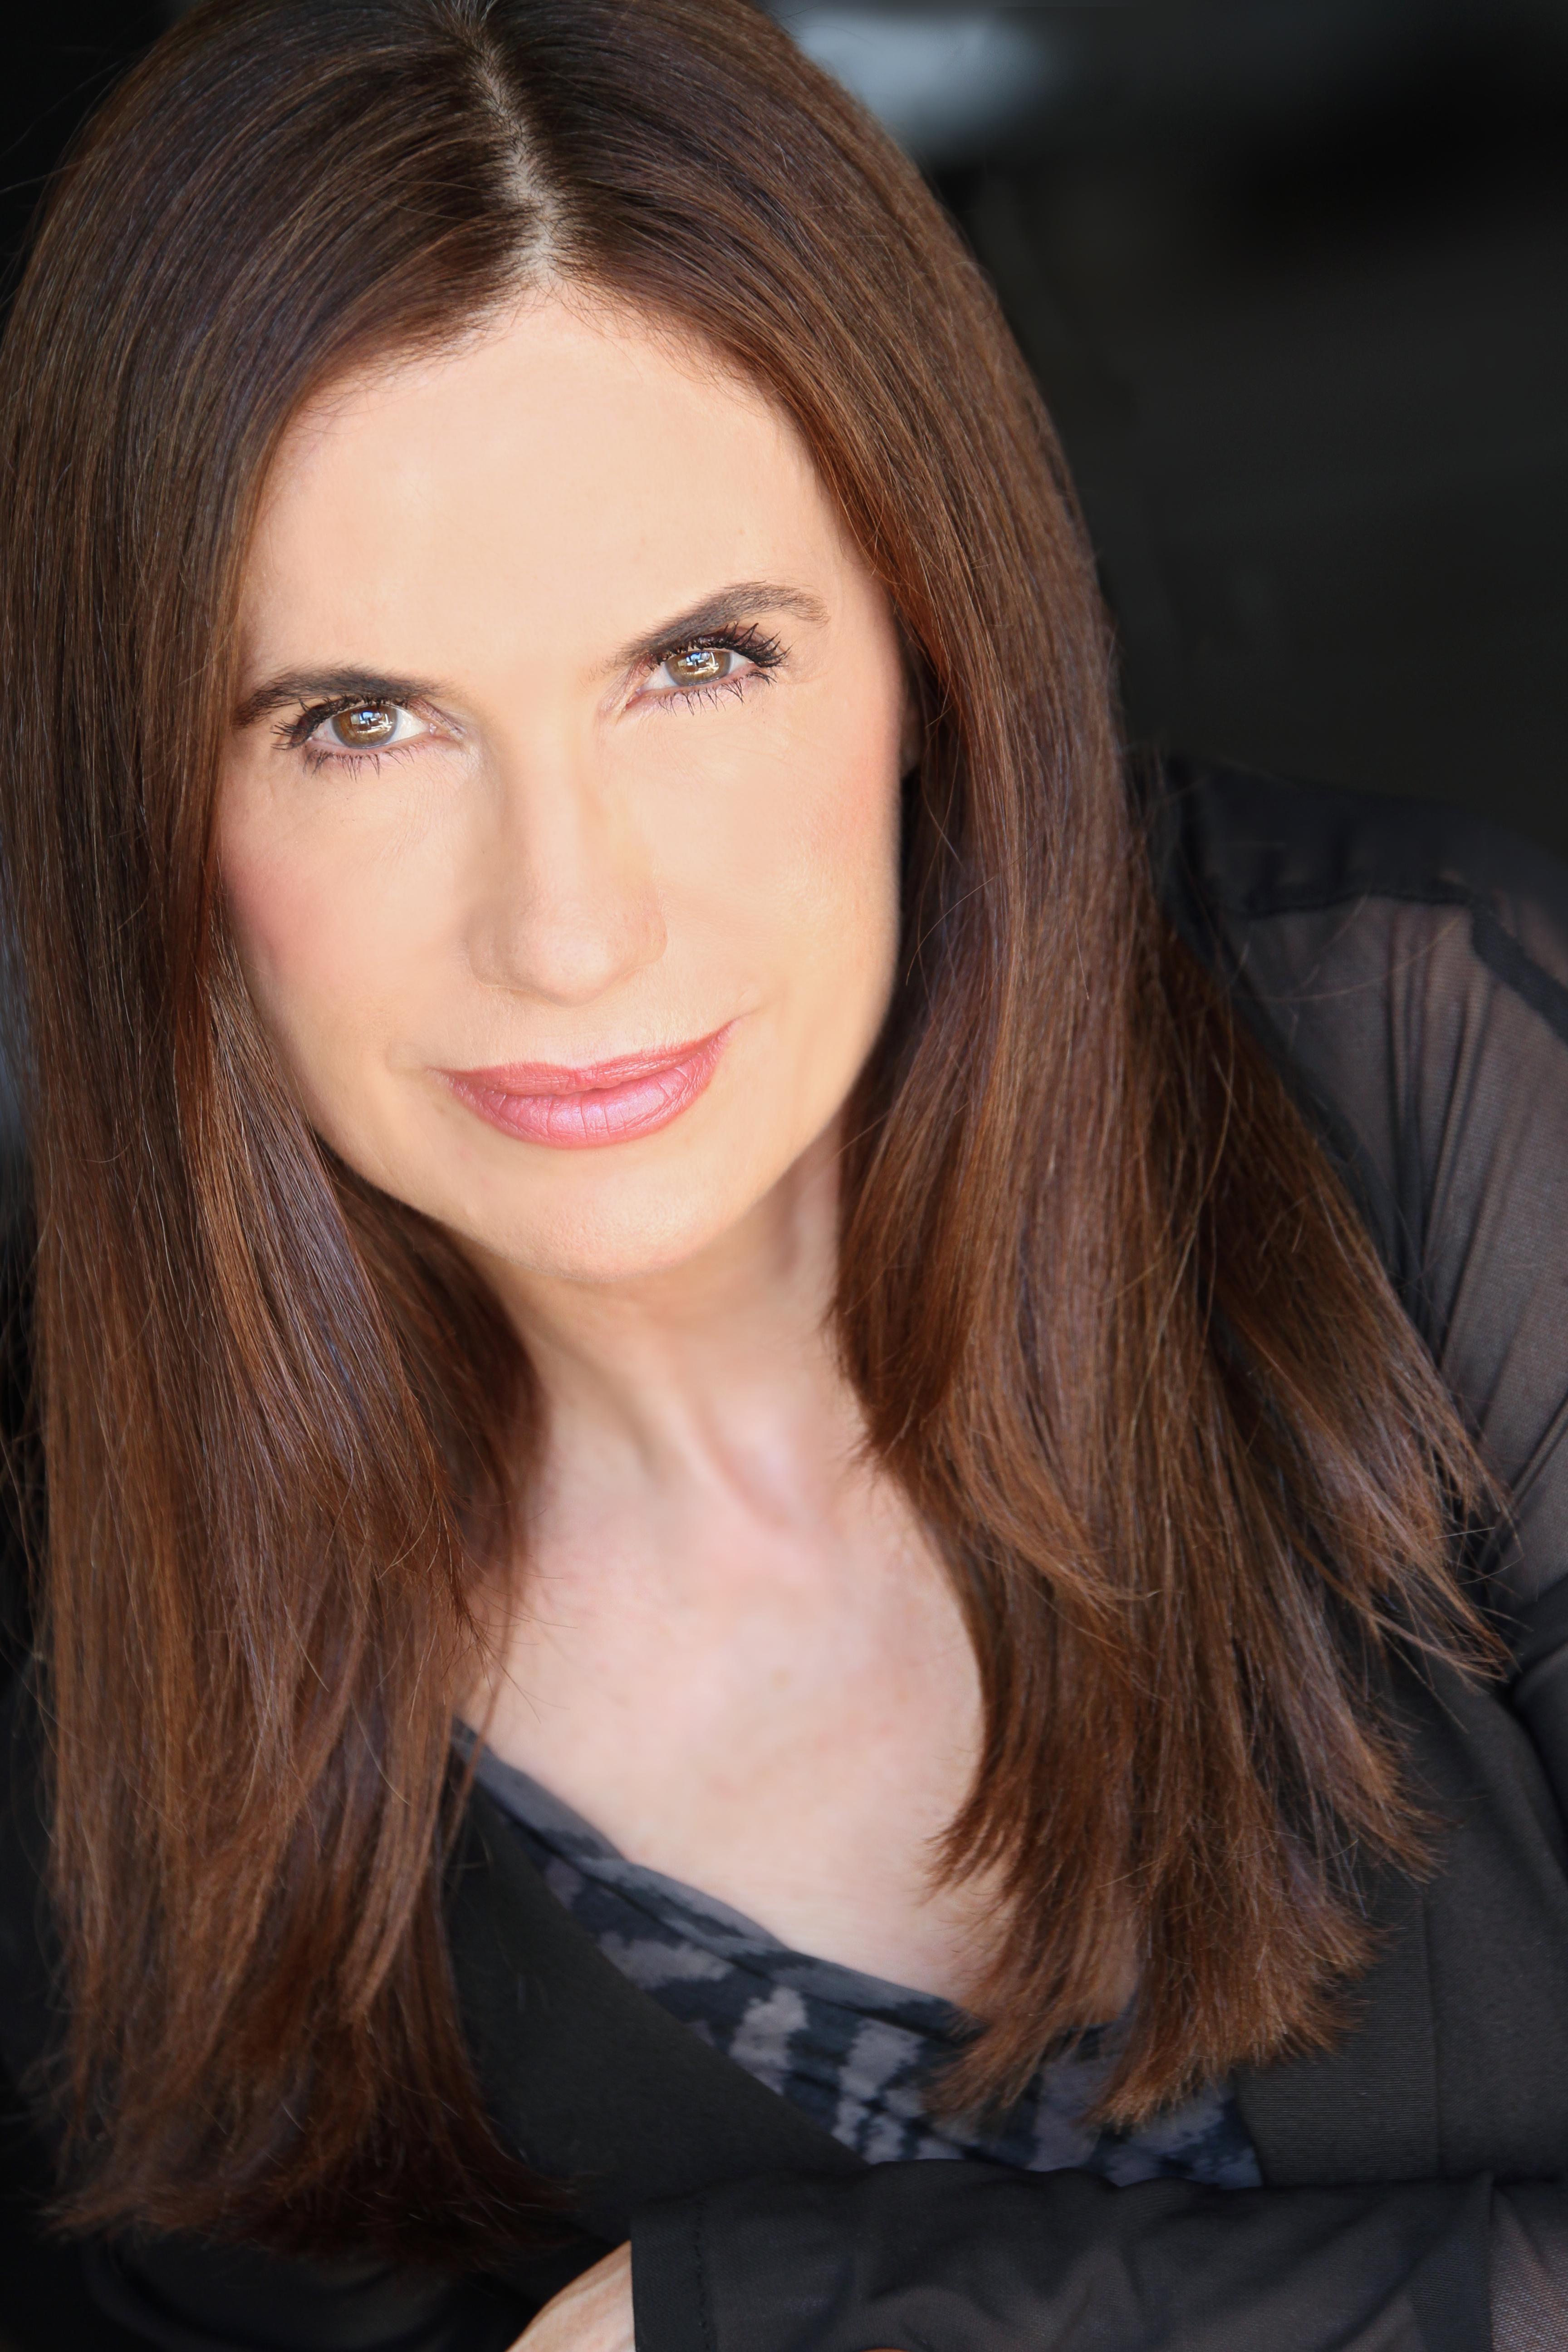 Ana Alicia actress